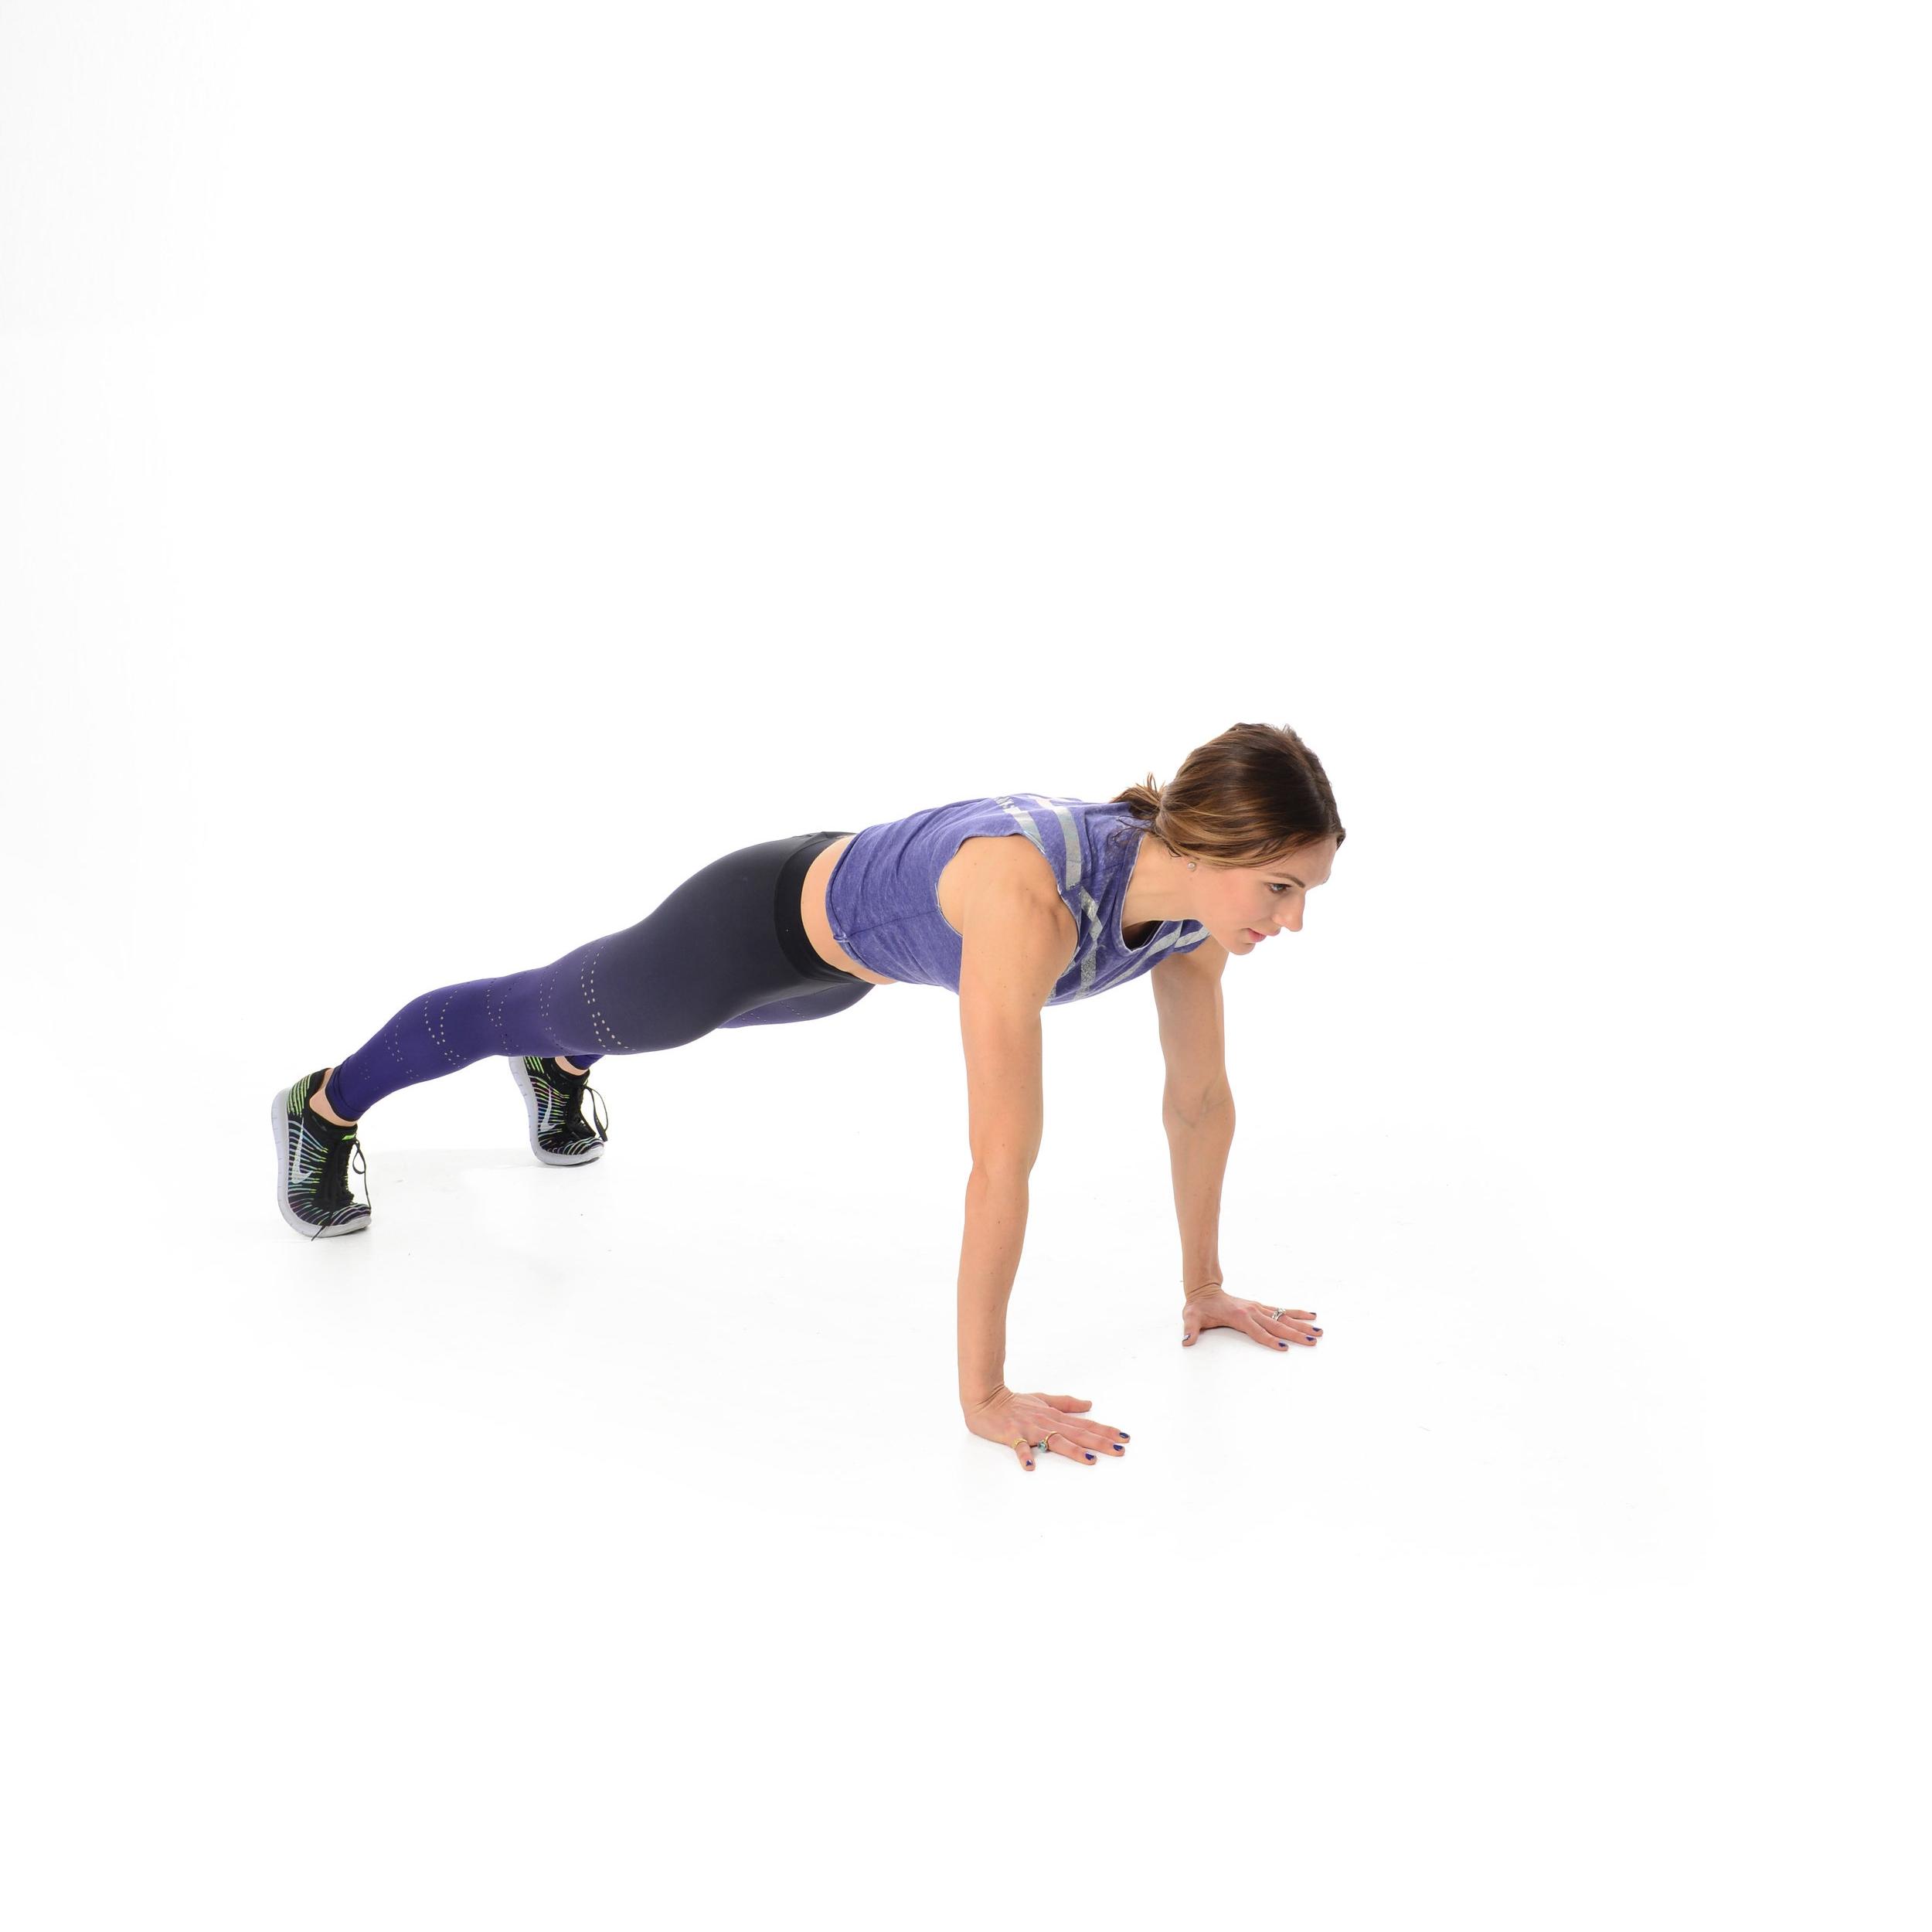 Straight arm plank - JCo Studios-7.jpg